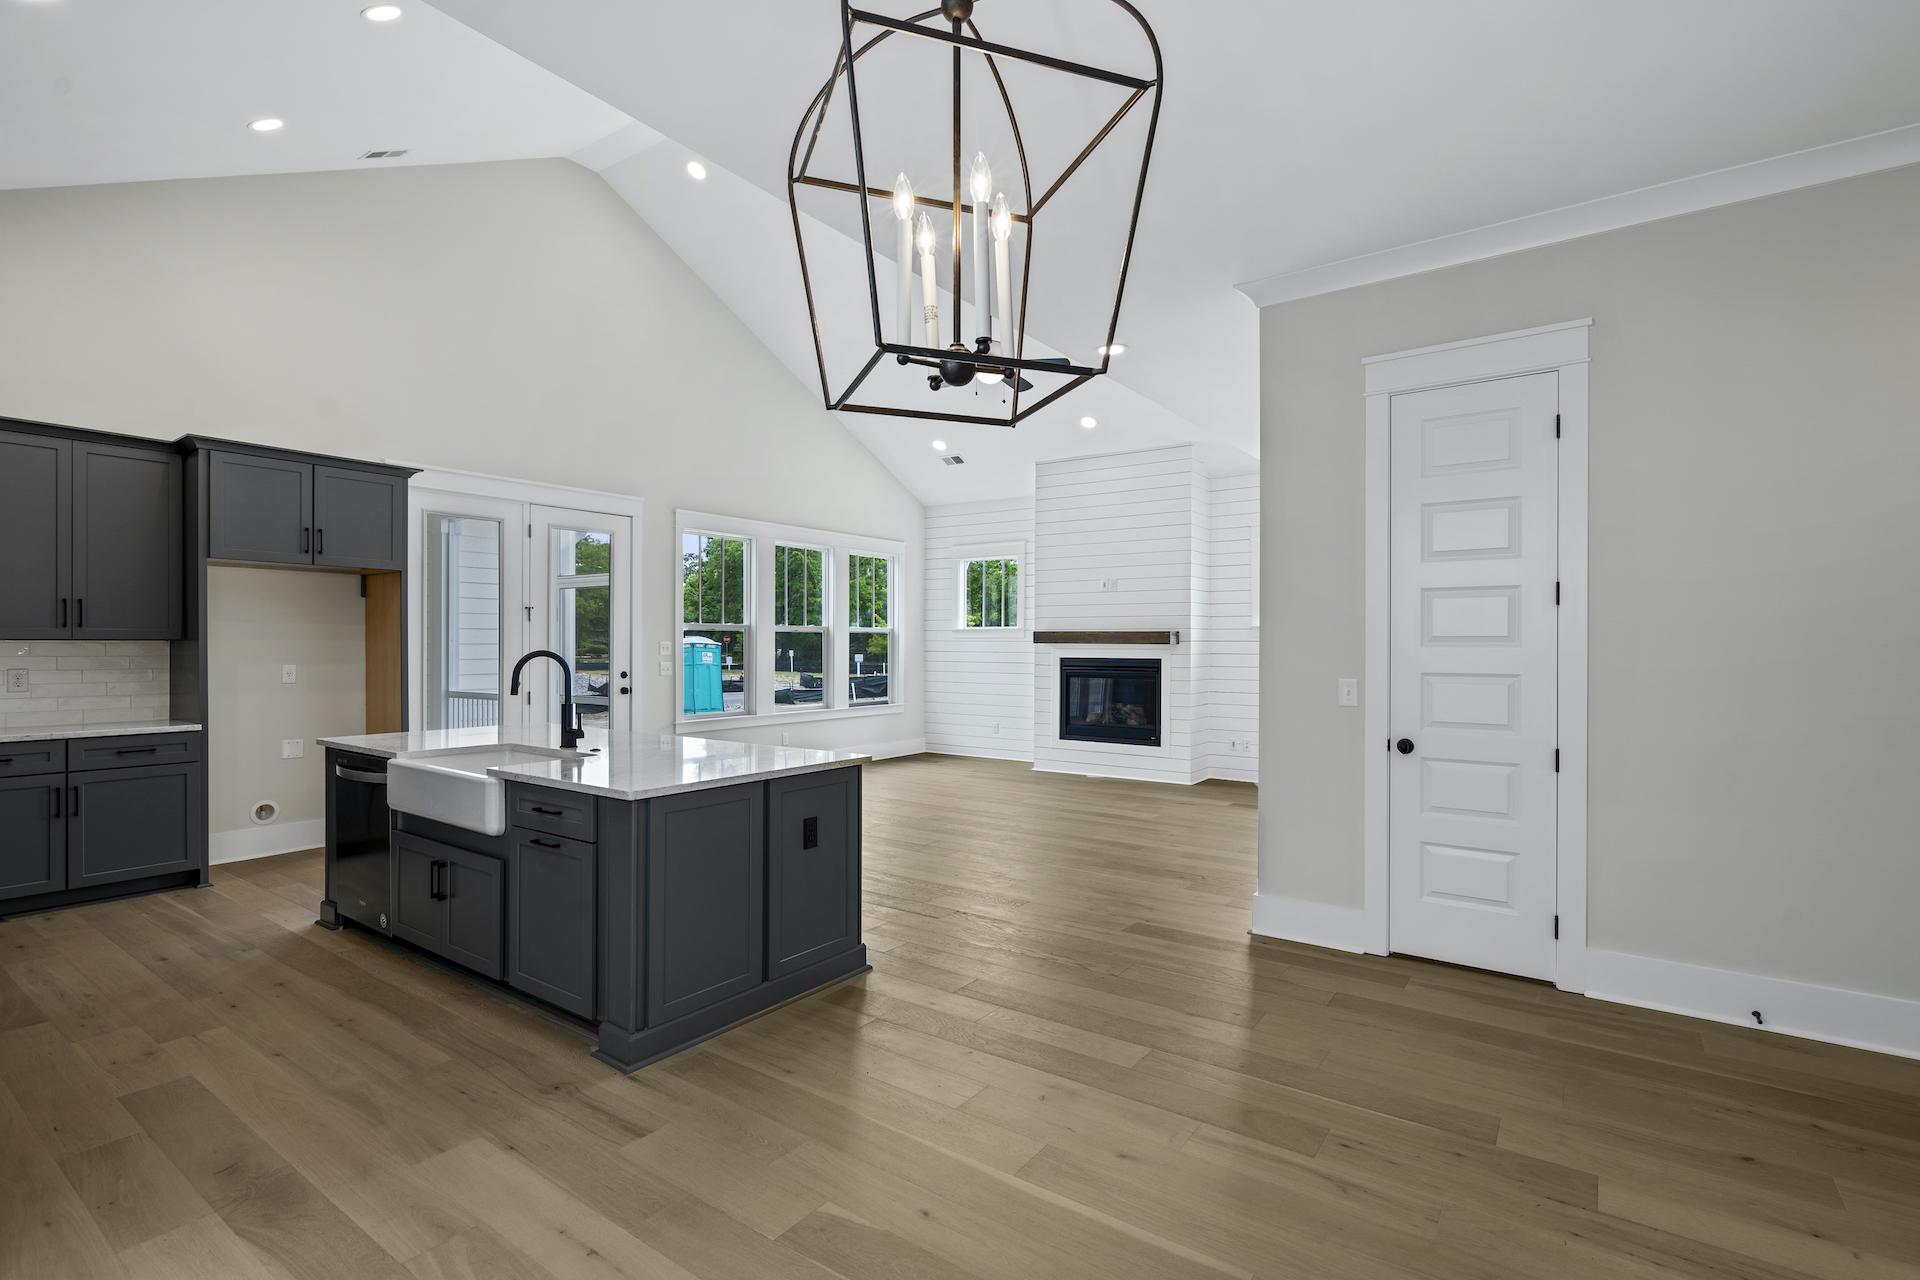 Midtown Homes For Sale - 1320 Upper Union, Mount Pleasant, SC - 34